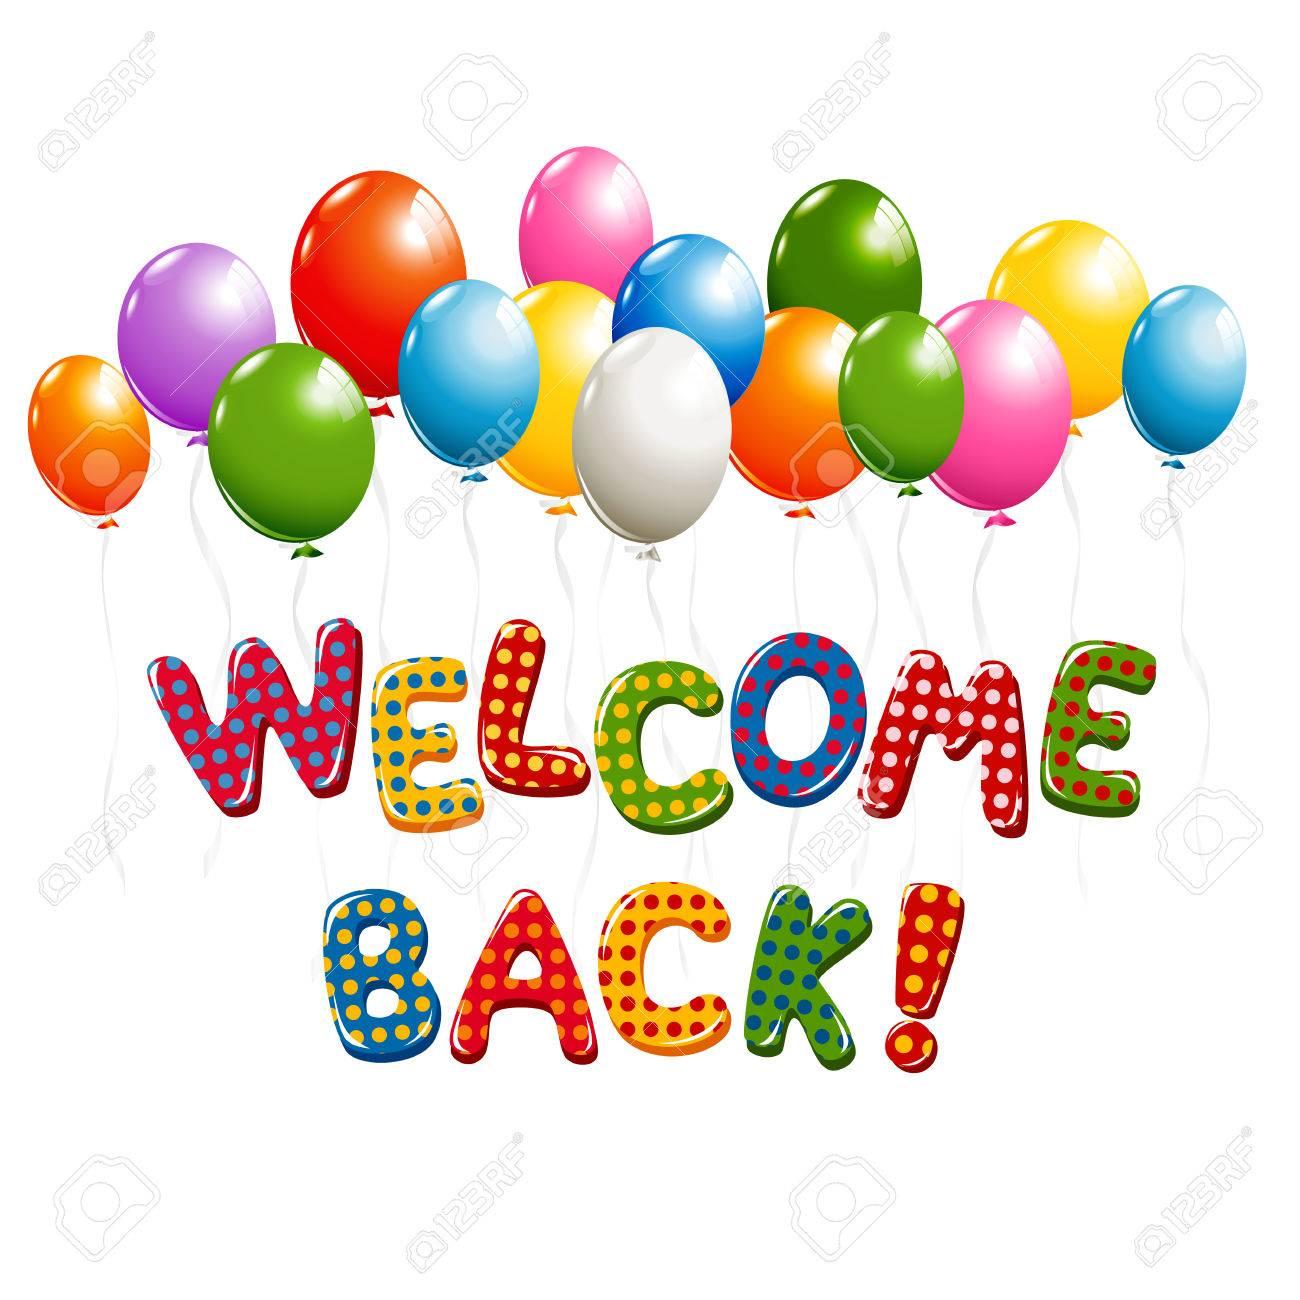 https://previews.123rf.com/images/tatus/tatus1606/tatus160600037/60238727-welcome-back-texte-dans-color%C3%A9-polka-dot-design-avec-des-ballons.jpg